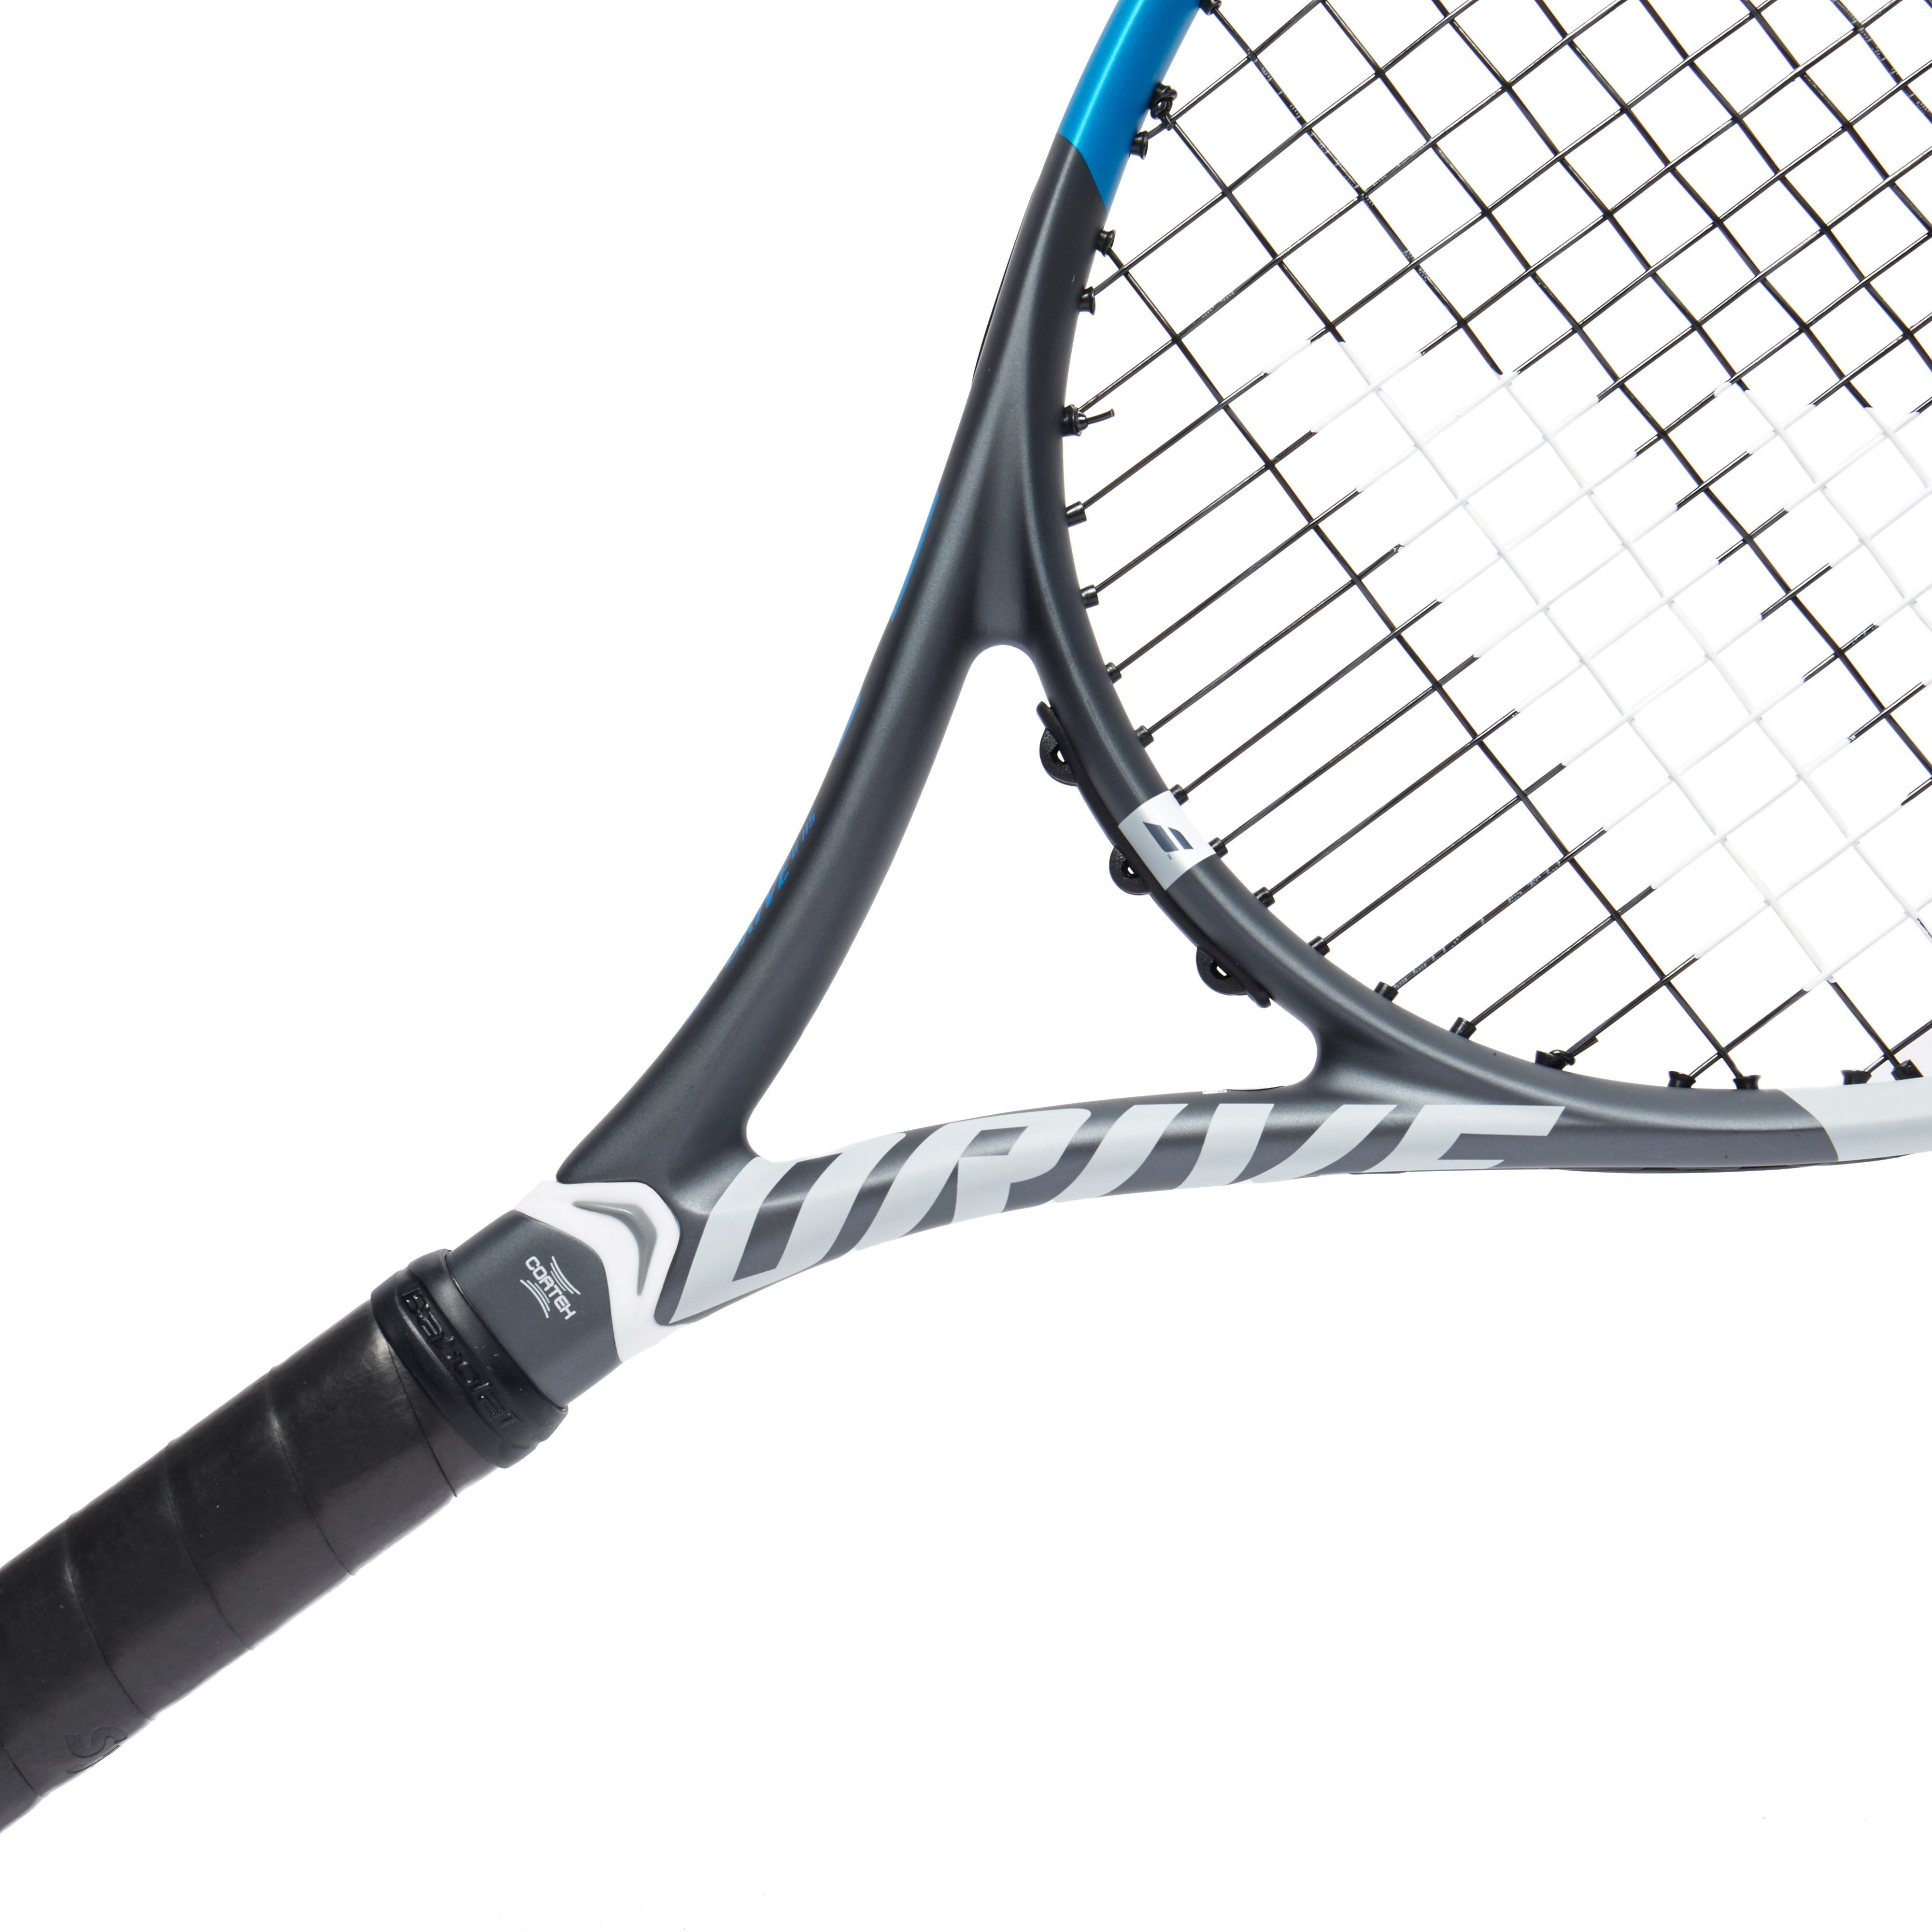 Babolat Drive G 115 Tennis Racket